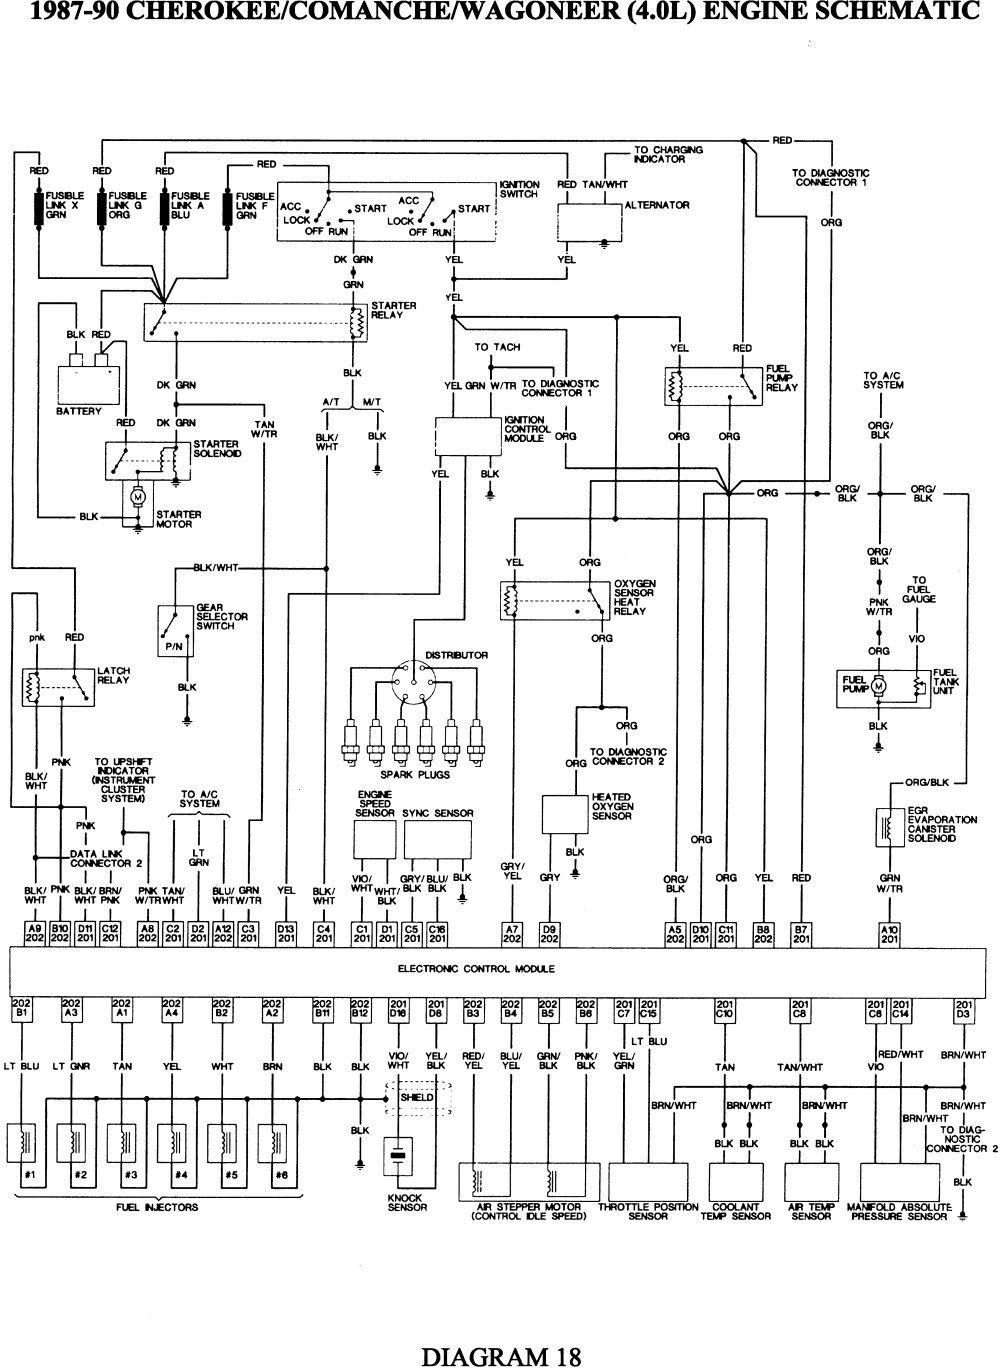 Marvelous 97 Jeep Cherokee Charging System Diagram Circuit Diagram Template Wiring Cloud Xortanetembamohammedshrineorg